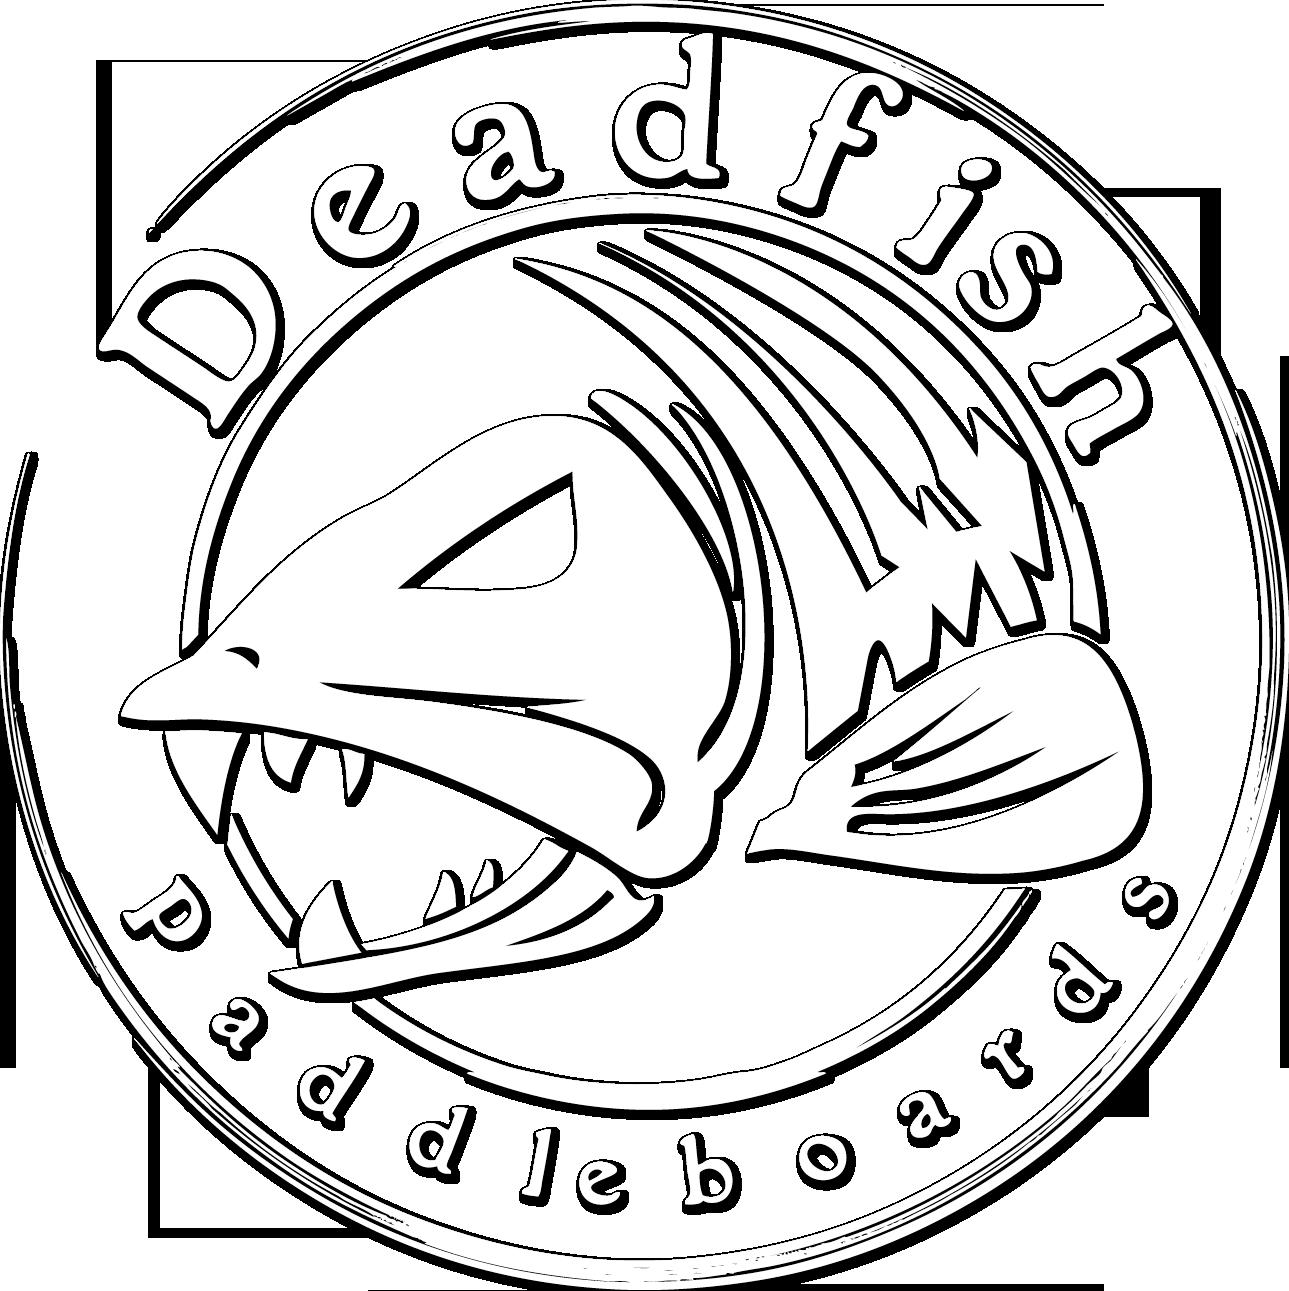 Circle clipart fish. Dead drawing at getdrawings